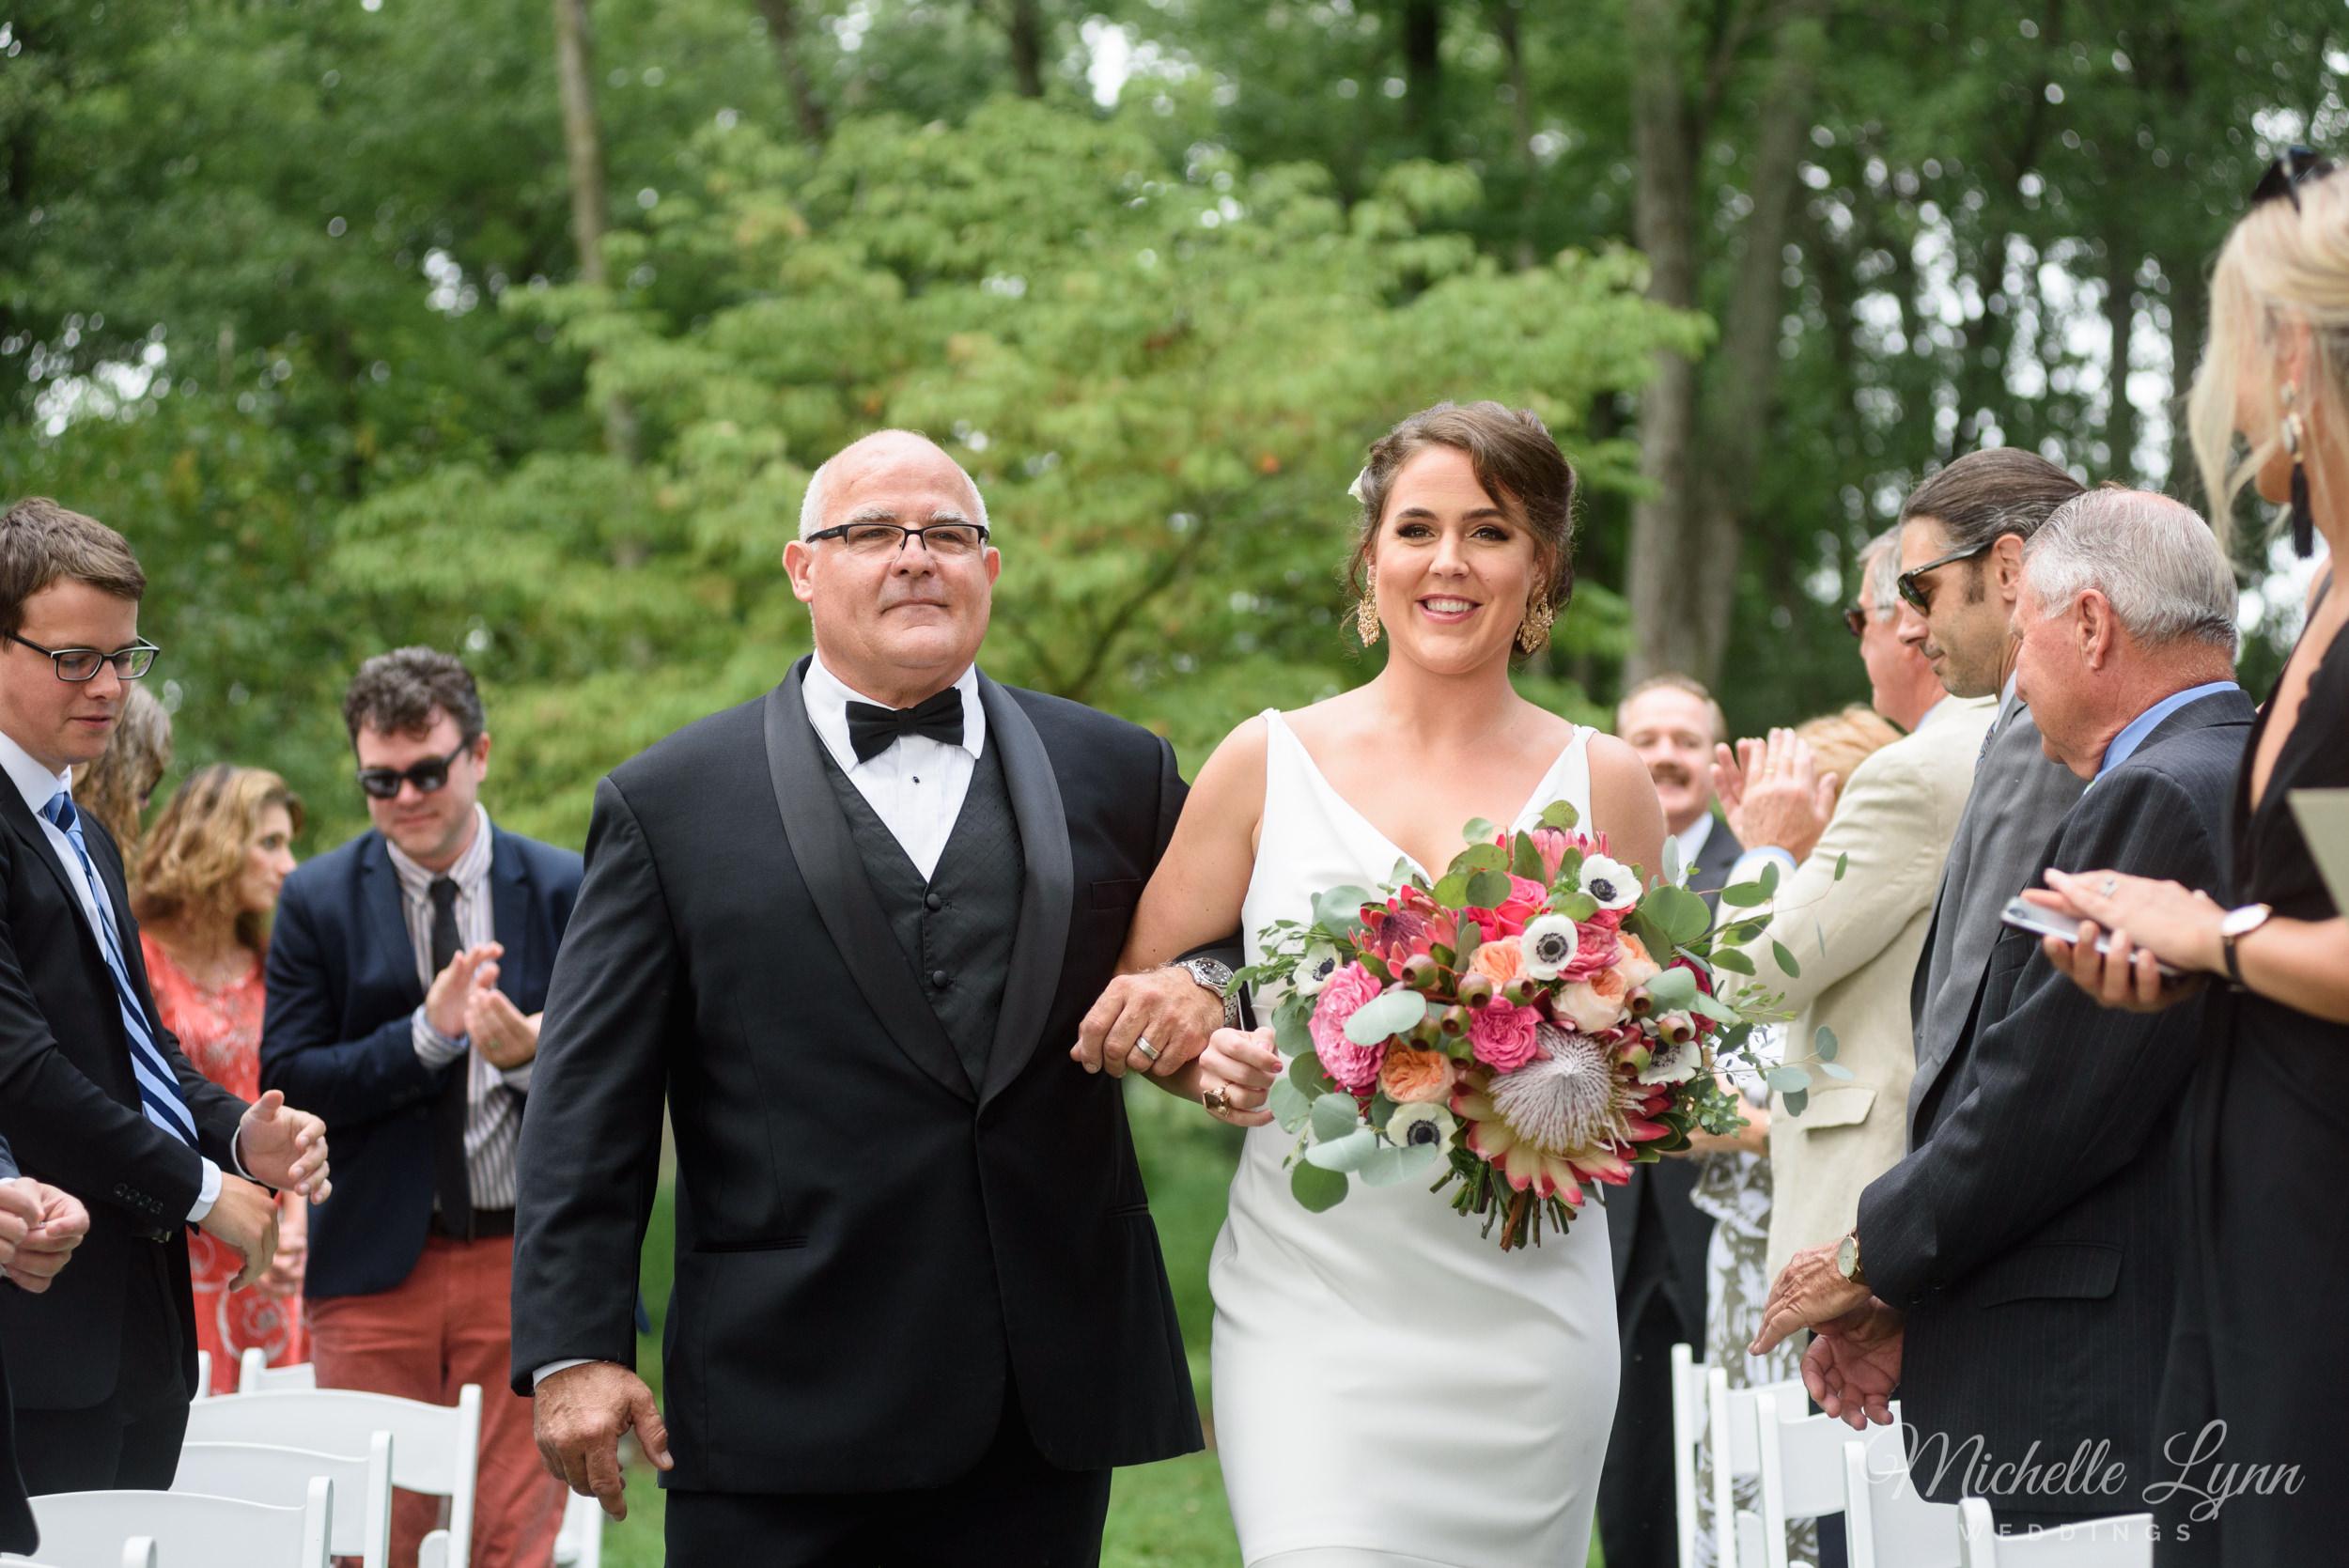 mlw-unionville-vineyards-nj-wedding-photography-34.jpg